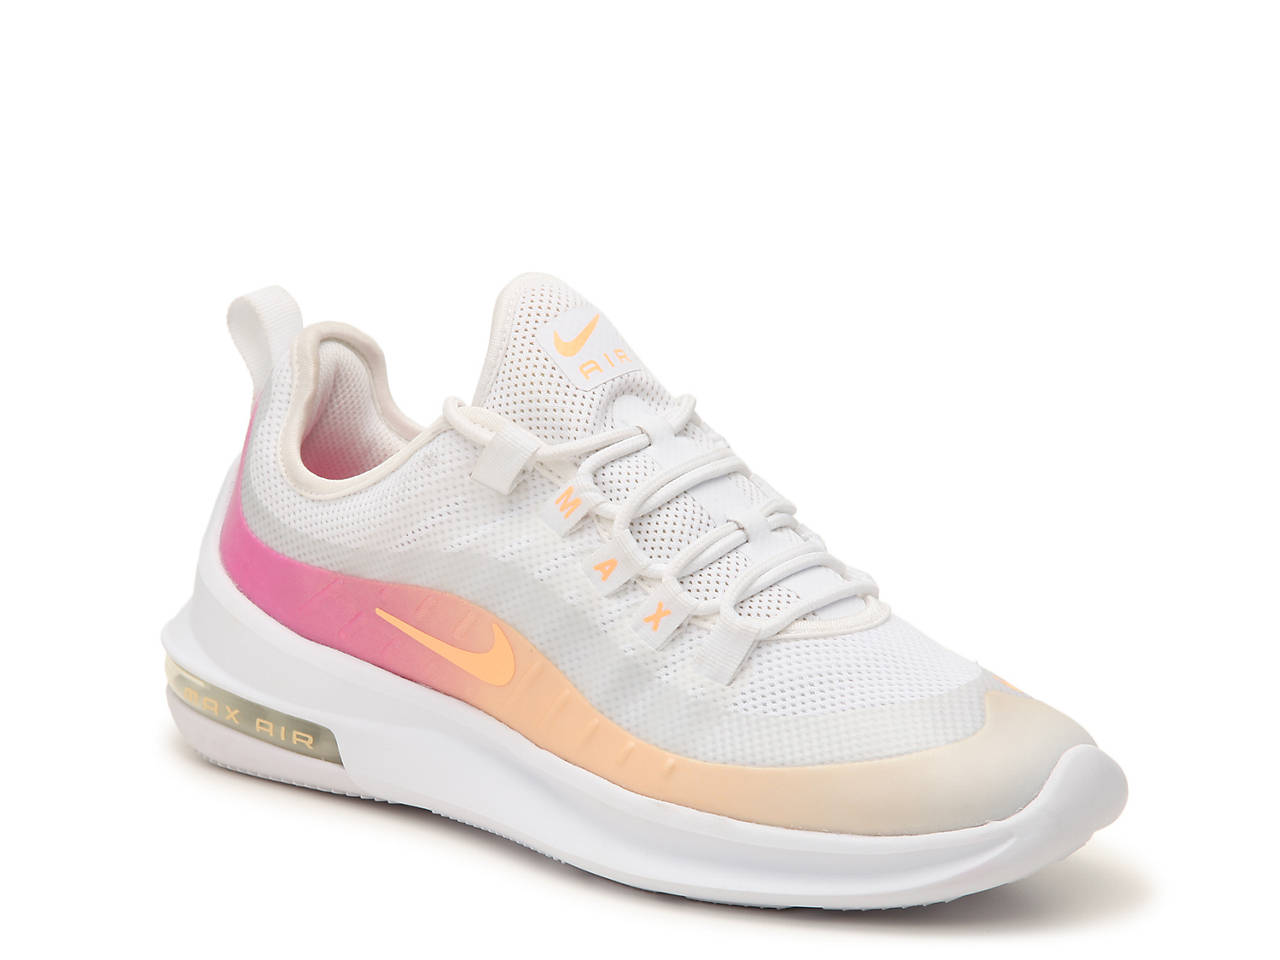 new styles 47360 802ba Nike. Air Max Axis Premium Sneaker - Women s